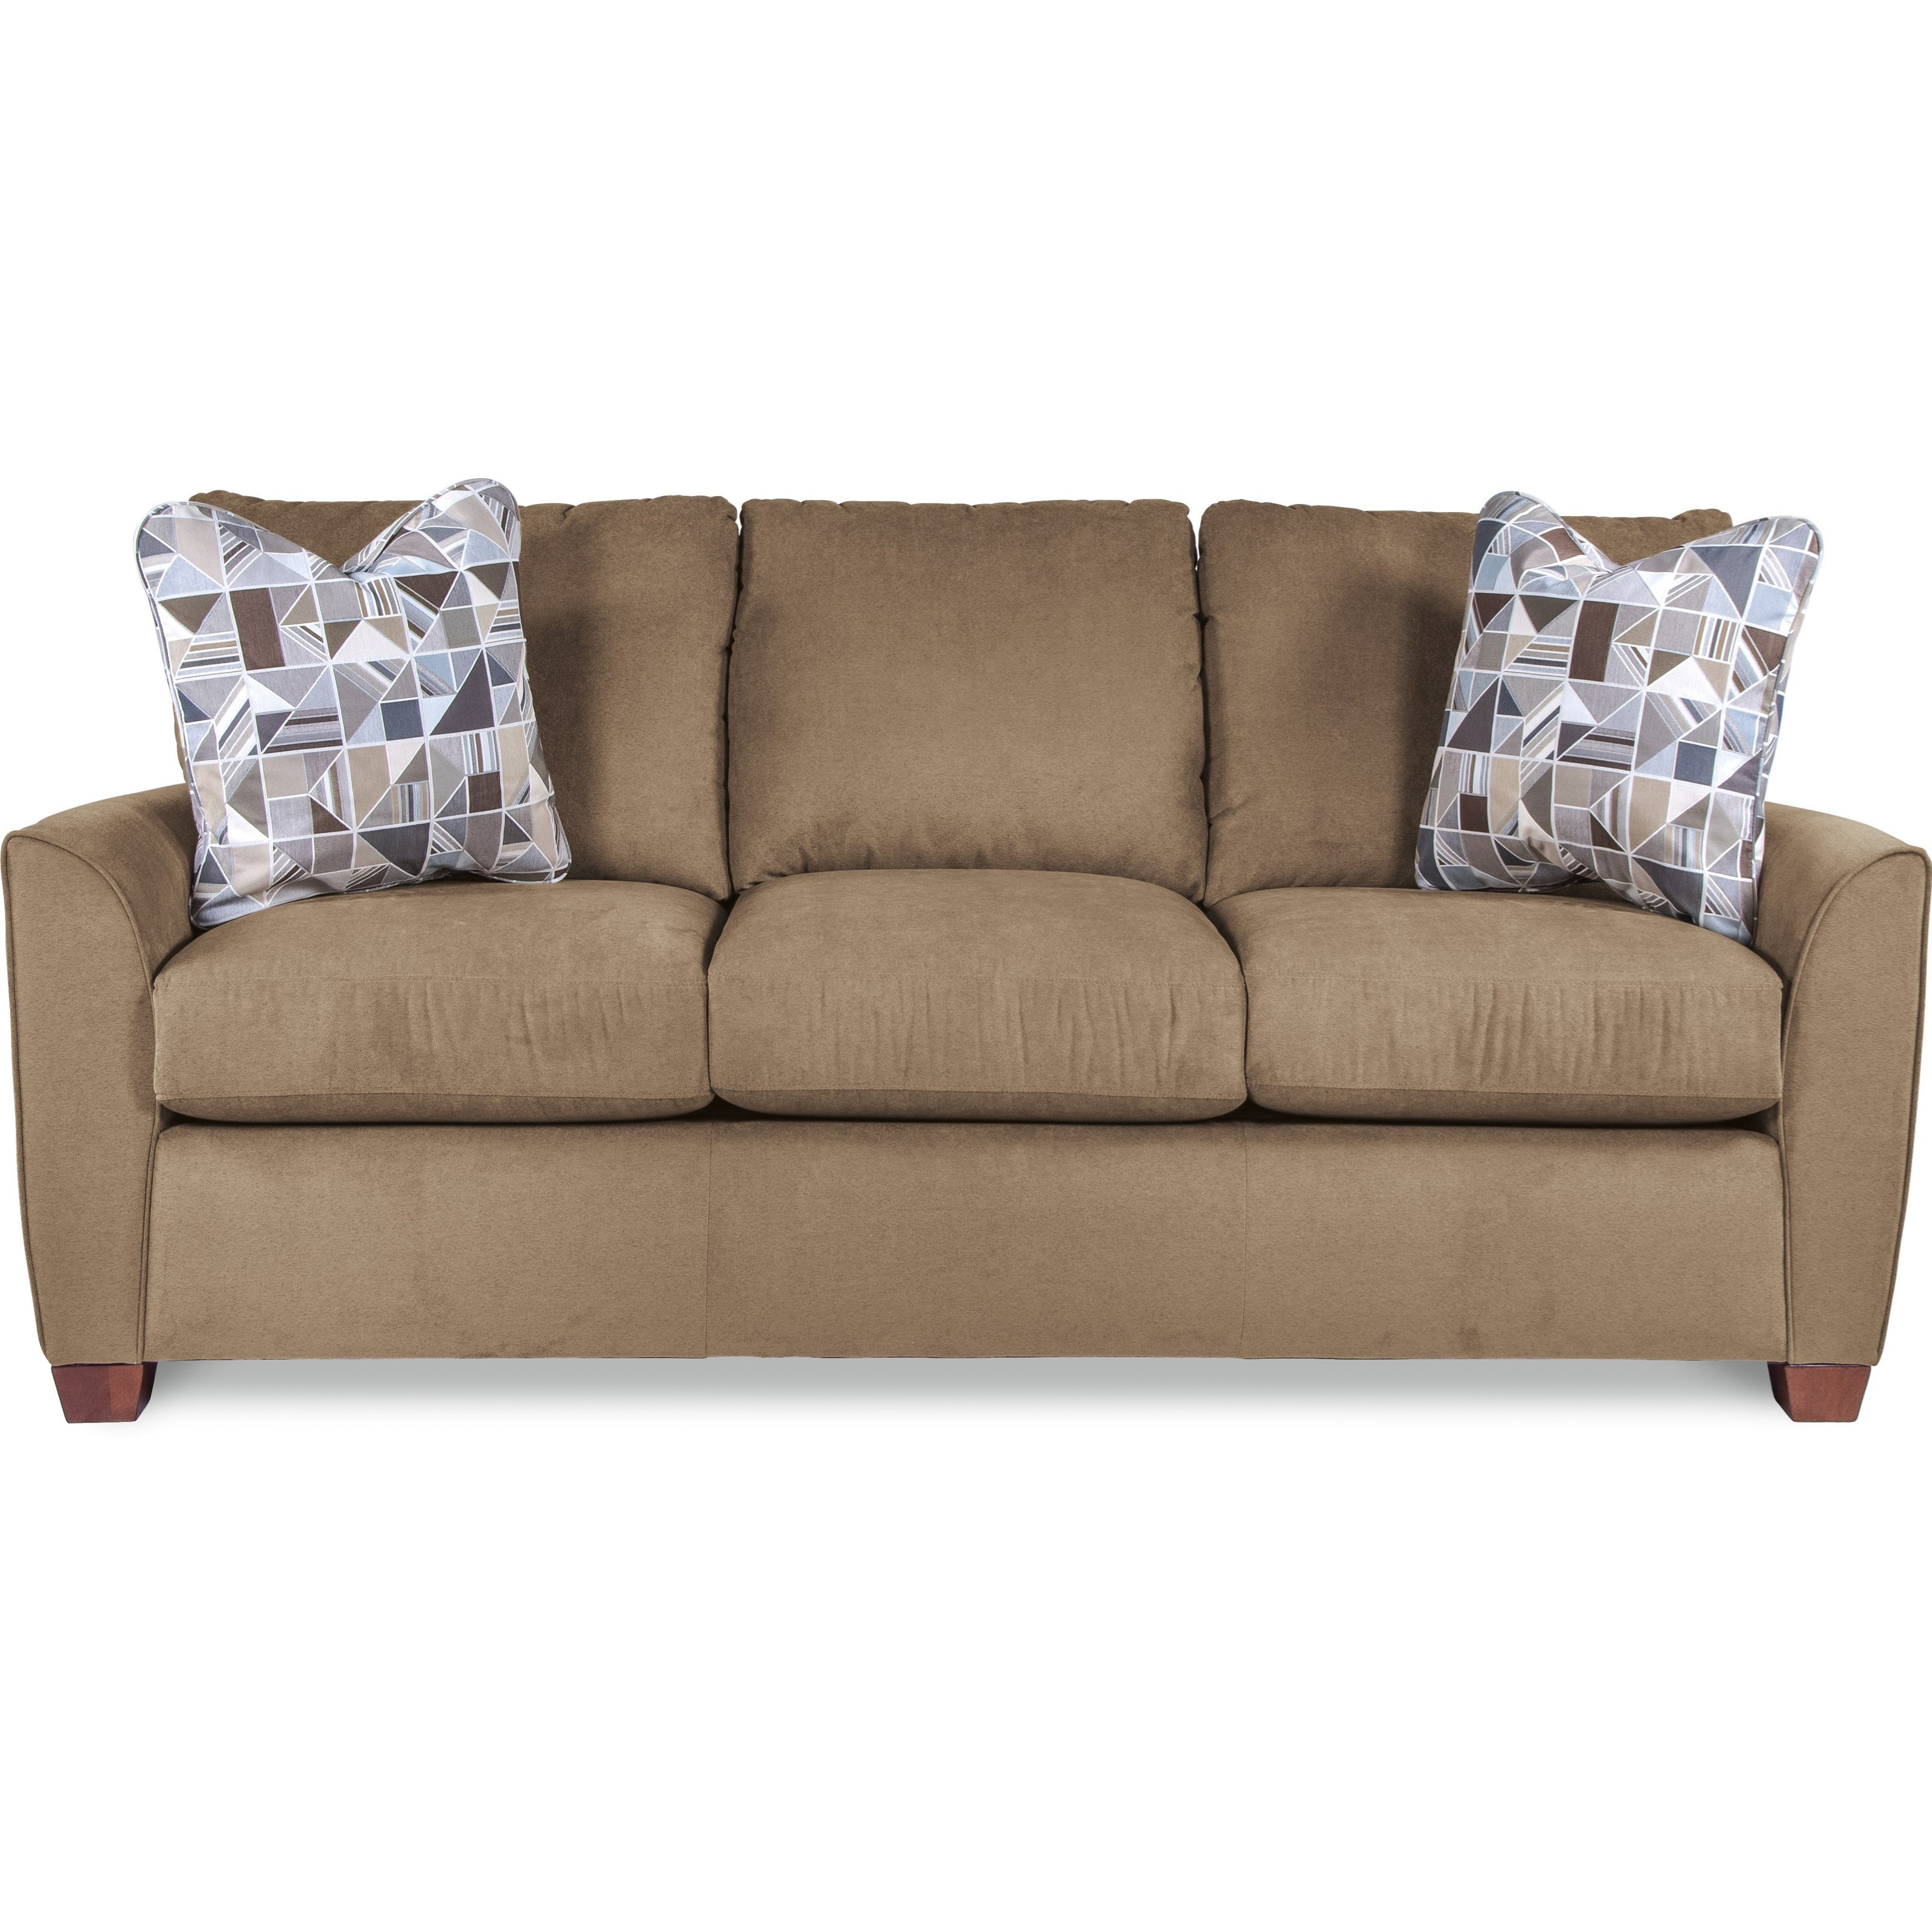 la z boy amy 610622 casual sofa with premier comfortcore cushions rh gillbros com lazboy sofa power cord lazboy sofa cover material rf991775